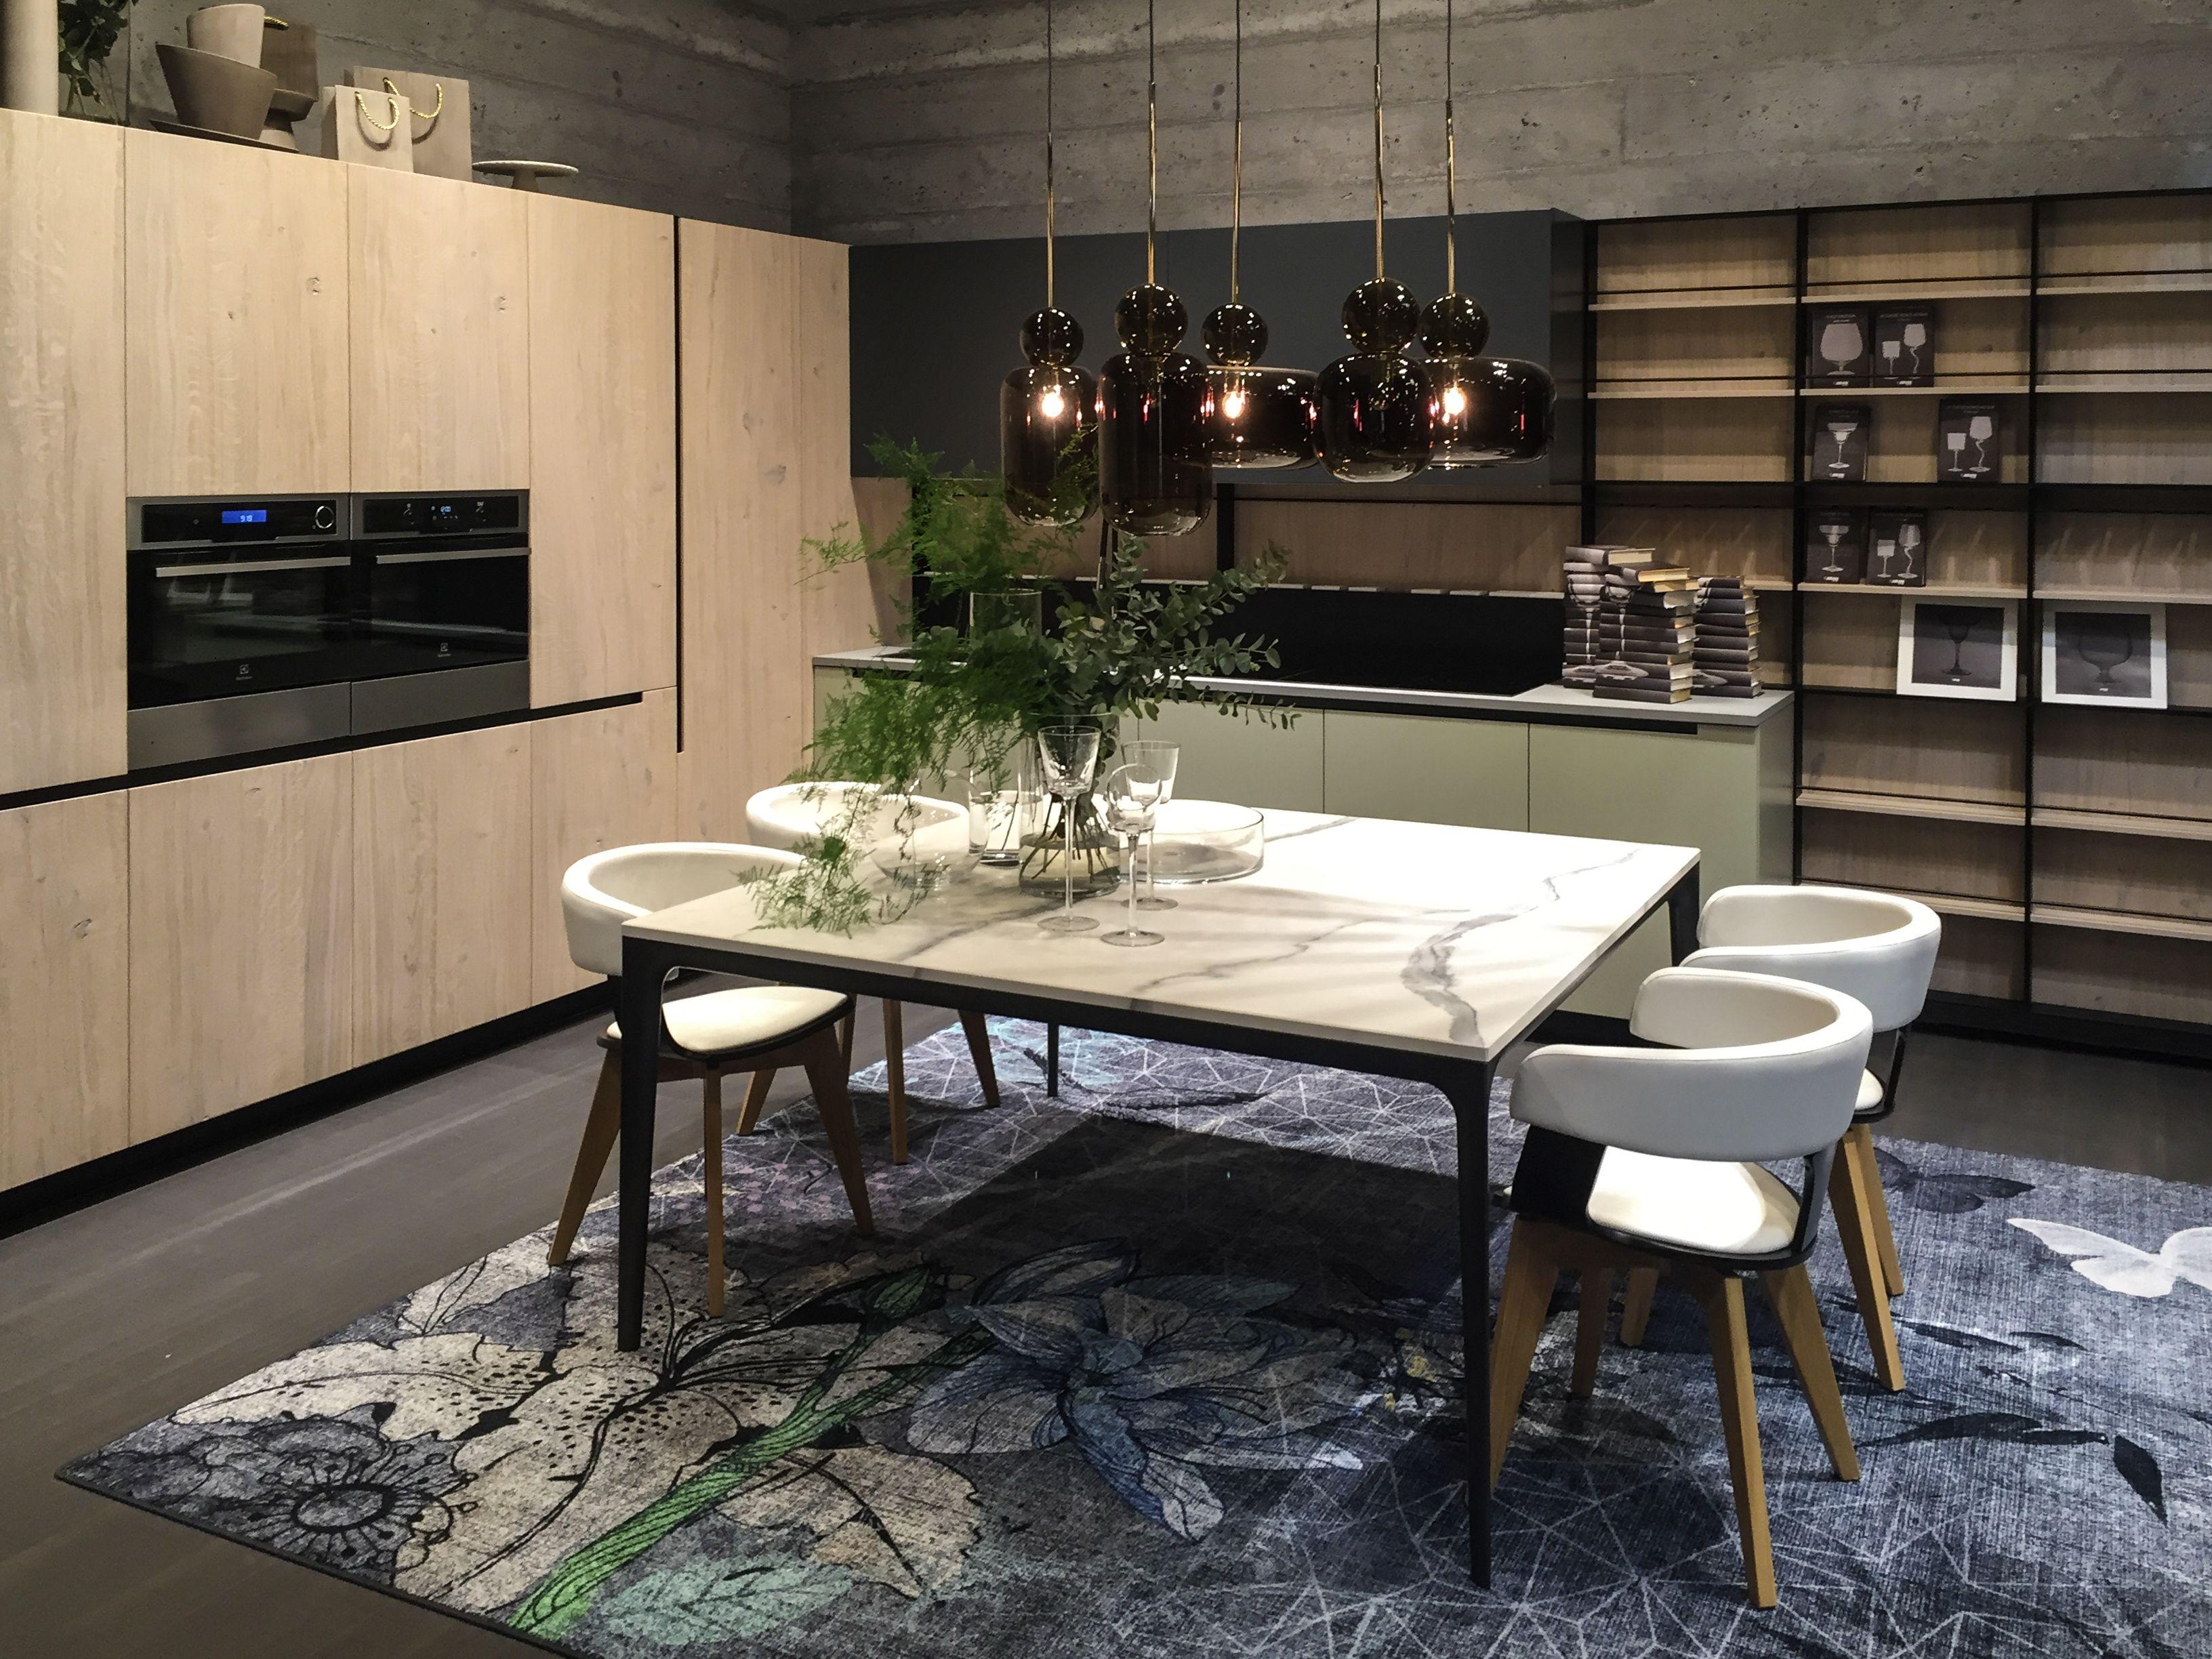 Introducing the new lab 13 kitchen from aran cucine at - Aran cucine lab 13 ...